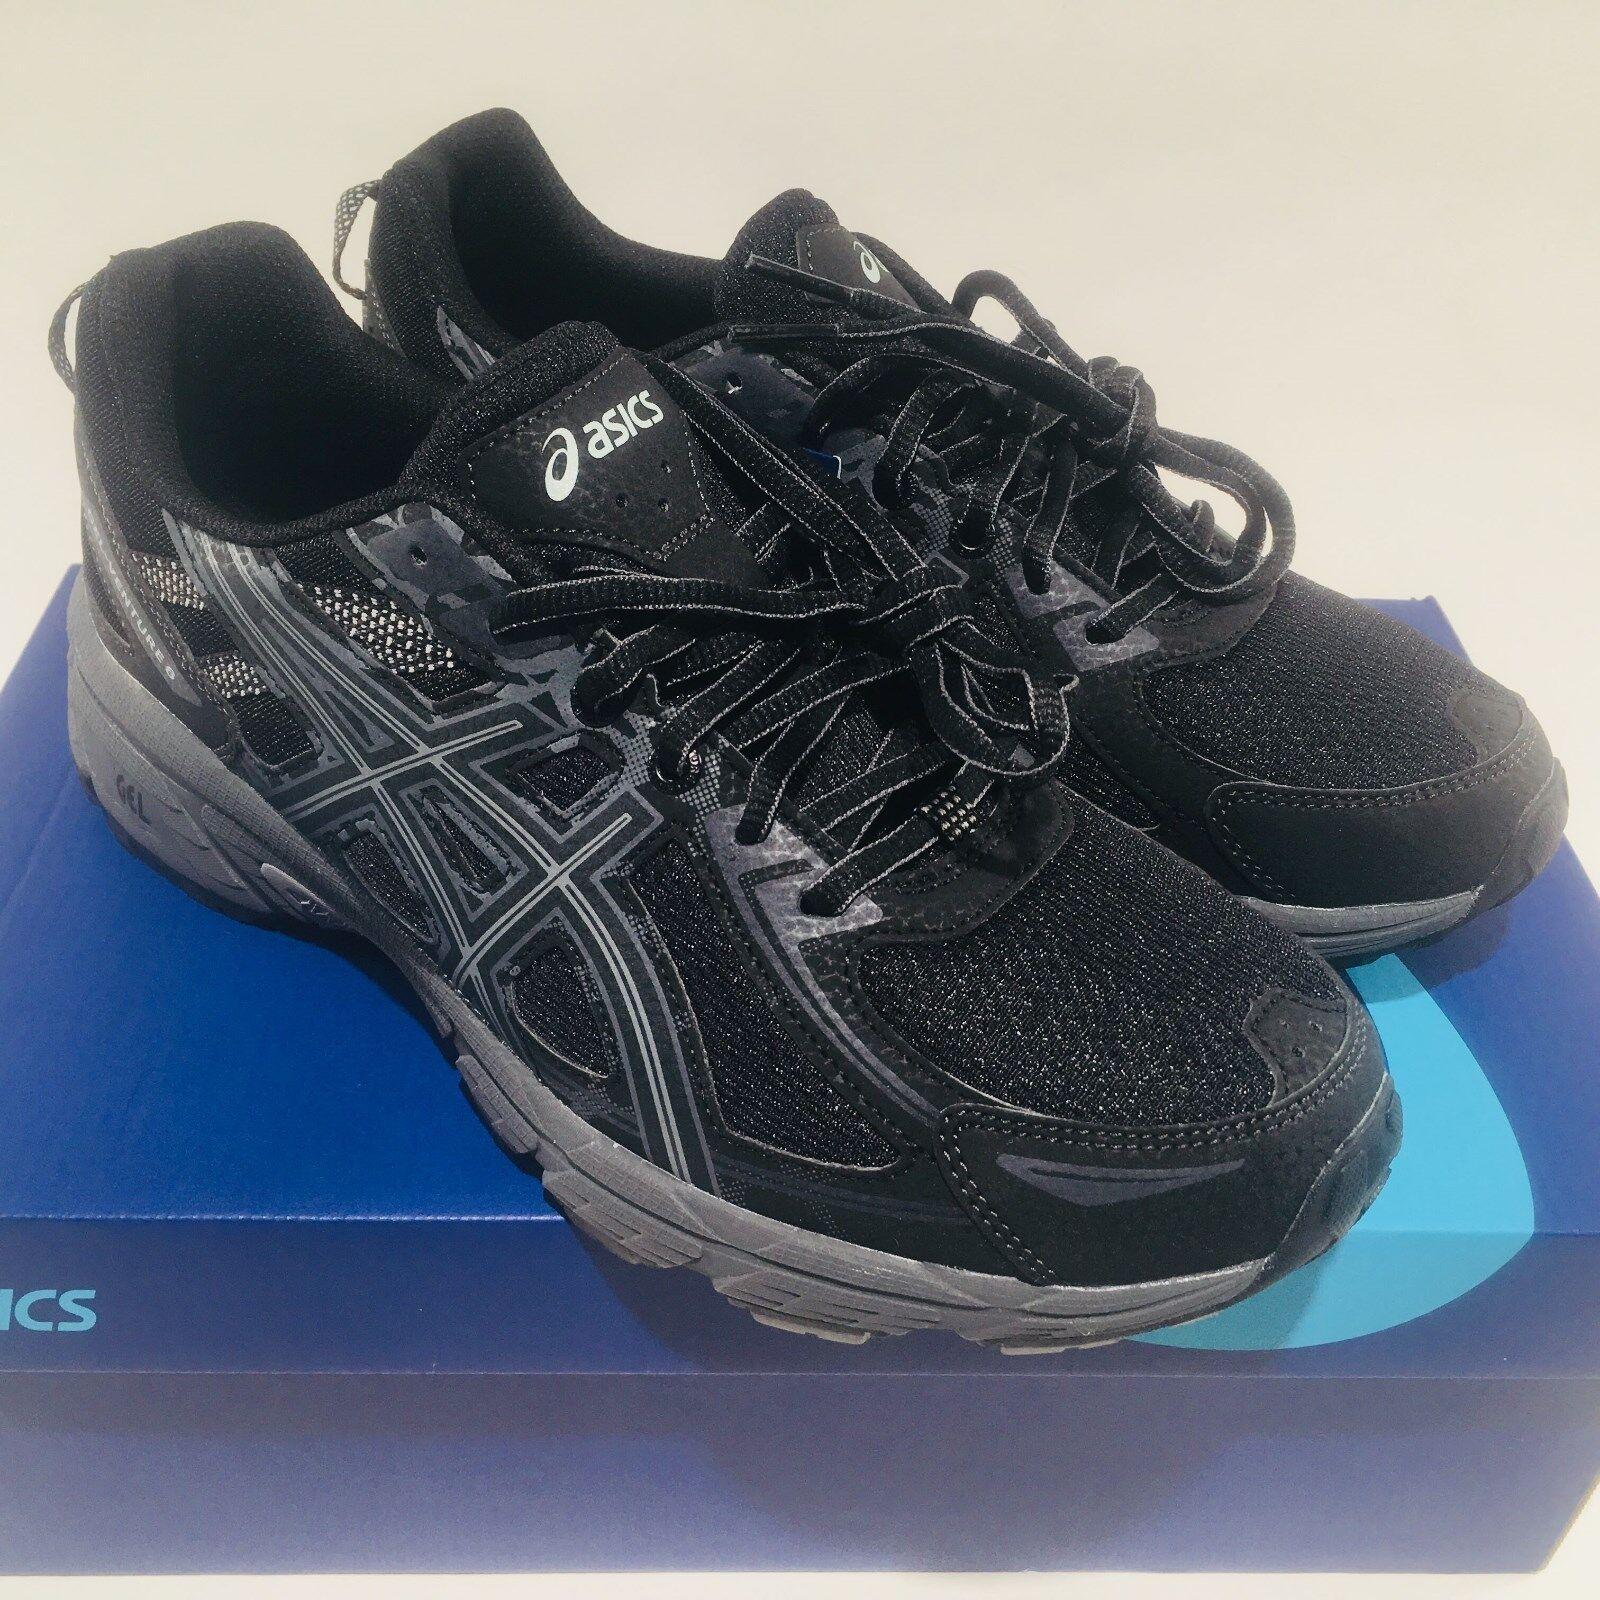 Asics Gel Venture 6 Homme 9.5 Noir Trail Running Chaussures NIB T7G1N PM